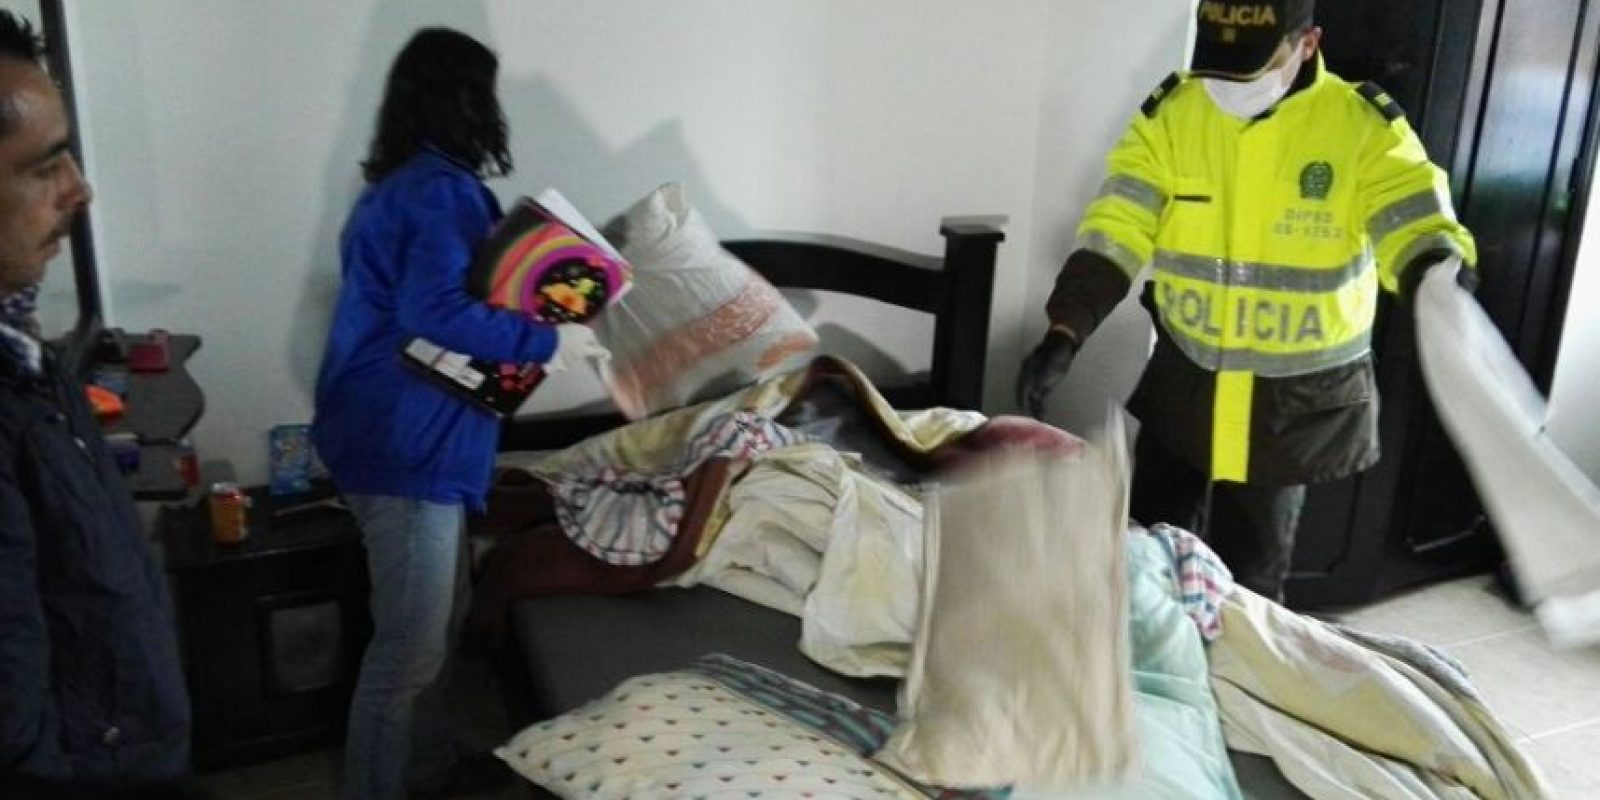 Foto:Cortesía Policía Metropolitana de Bogotá